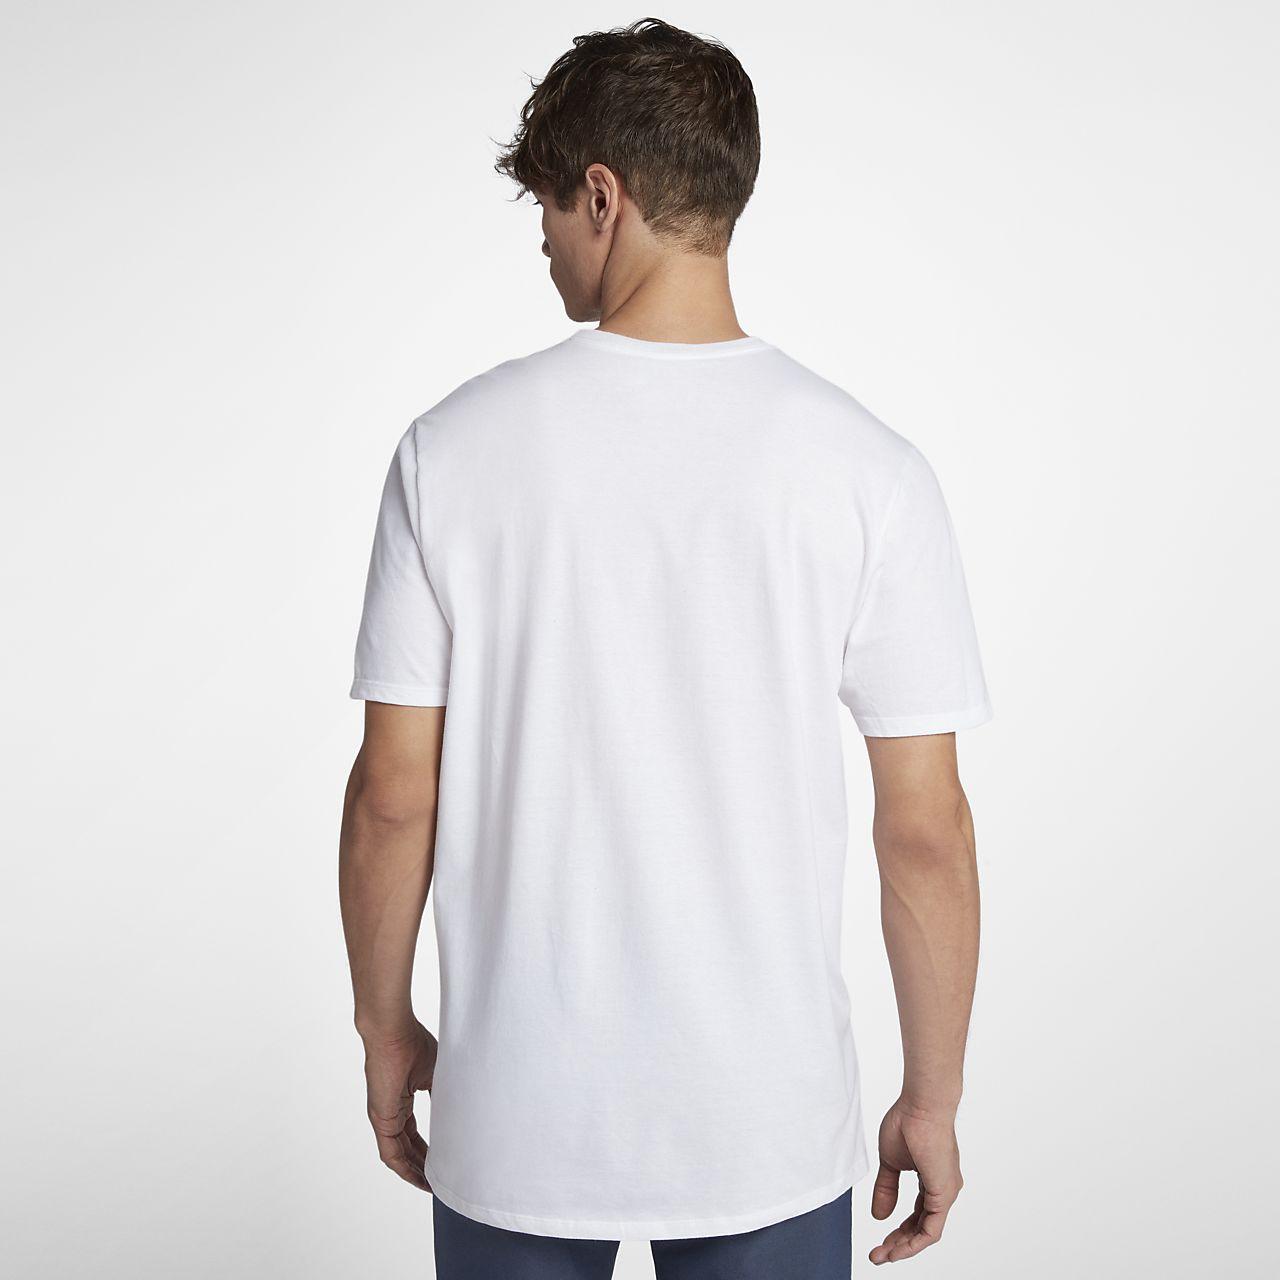 Hurley Premium Breaking Sets Men s T-Shirt. Nike.com 06dc3e787a